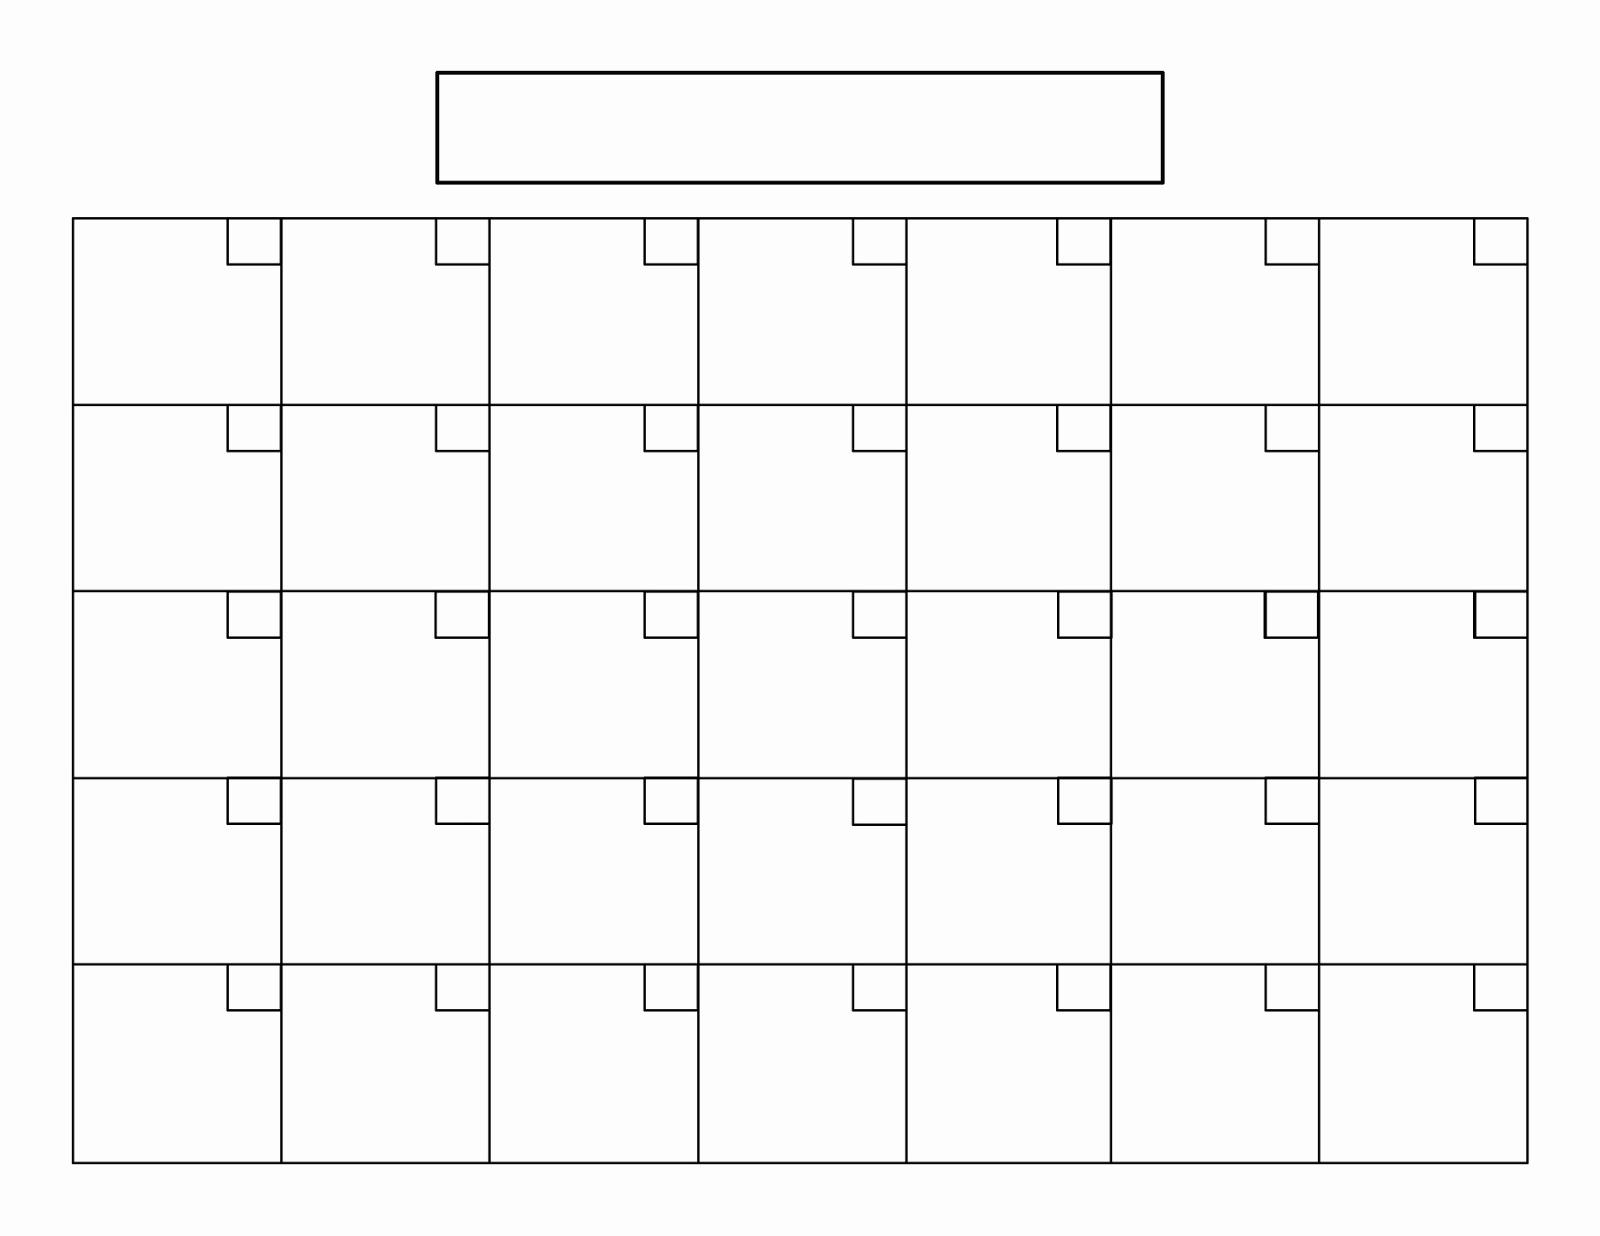 Blank Calendar Print Out Blank Free Printable Blank Calendar with Printable Blank Monthly Calendar Template